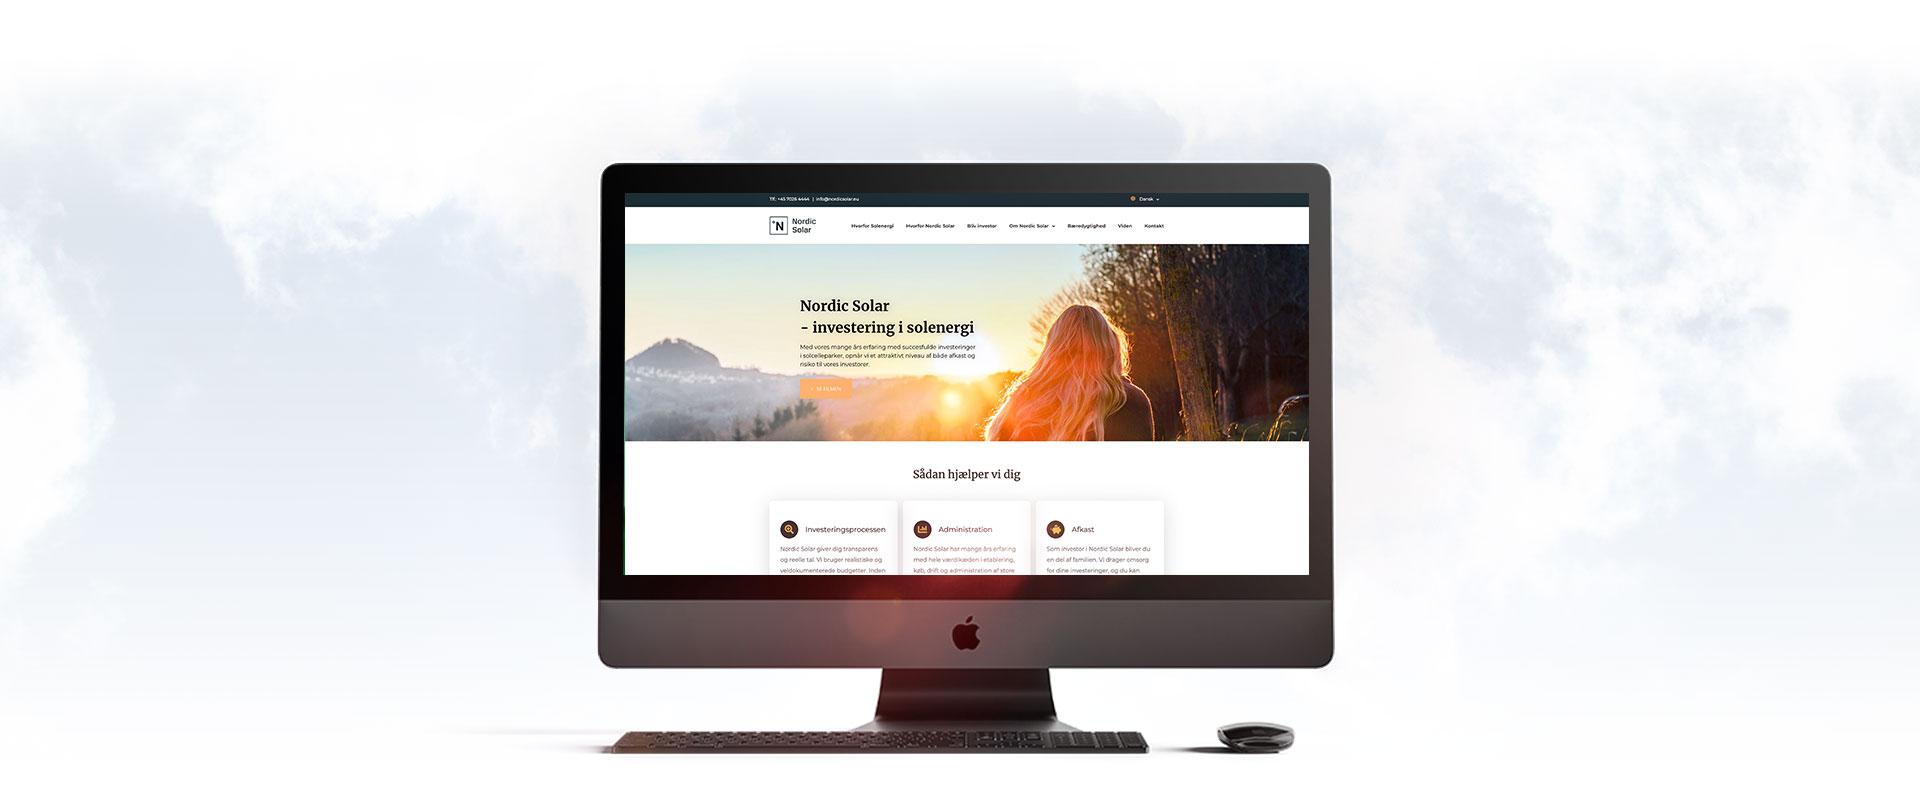 Nordic Solar website